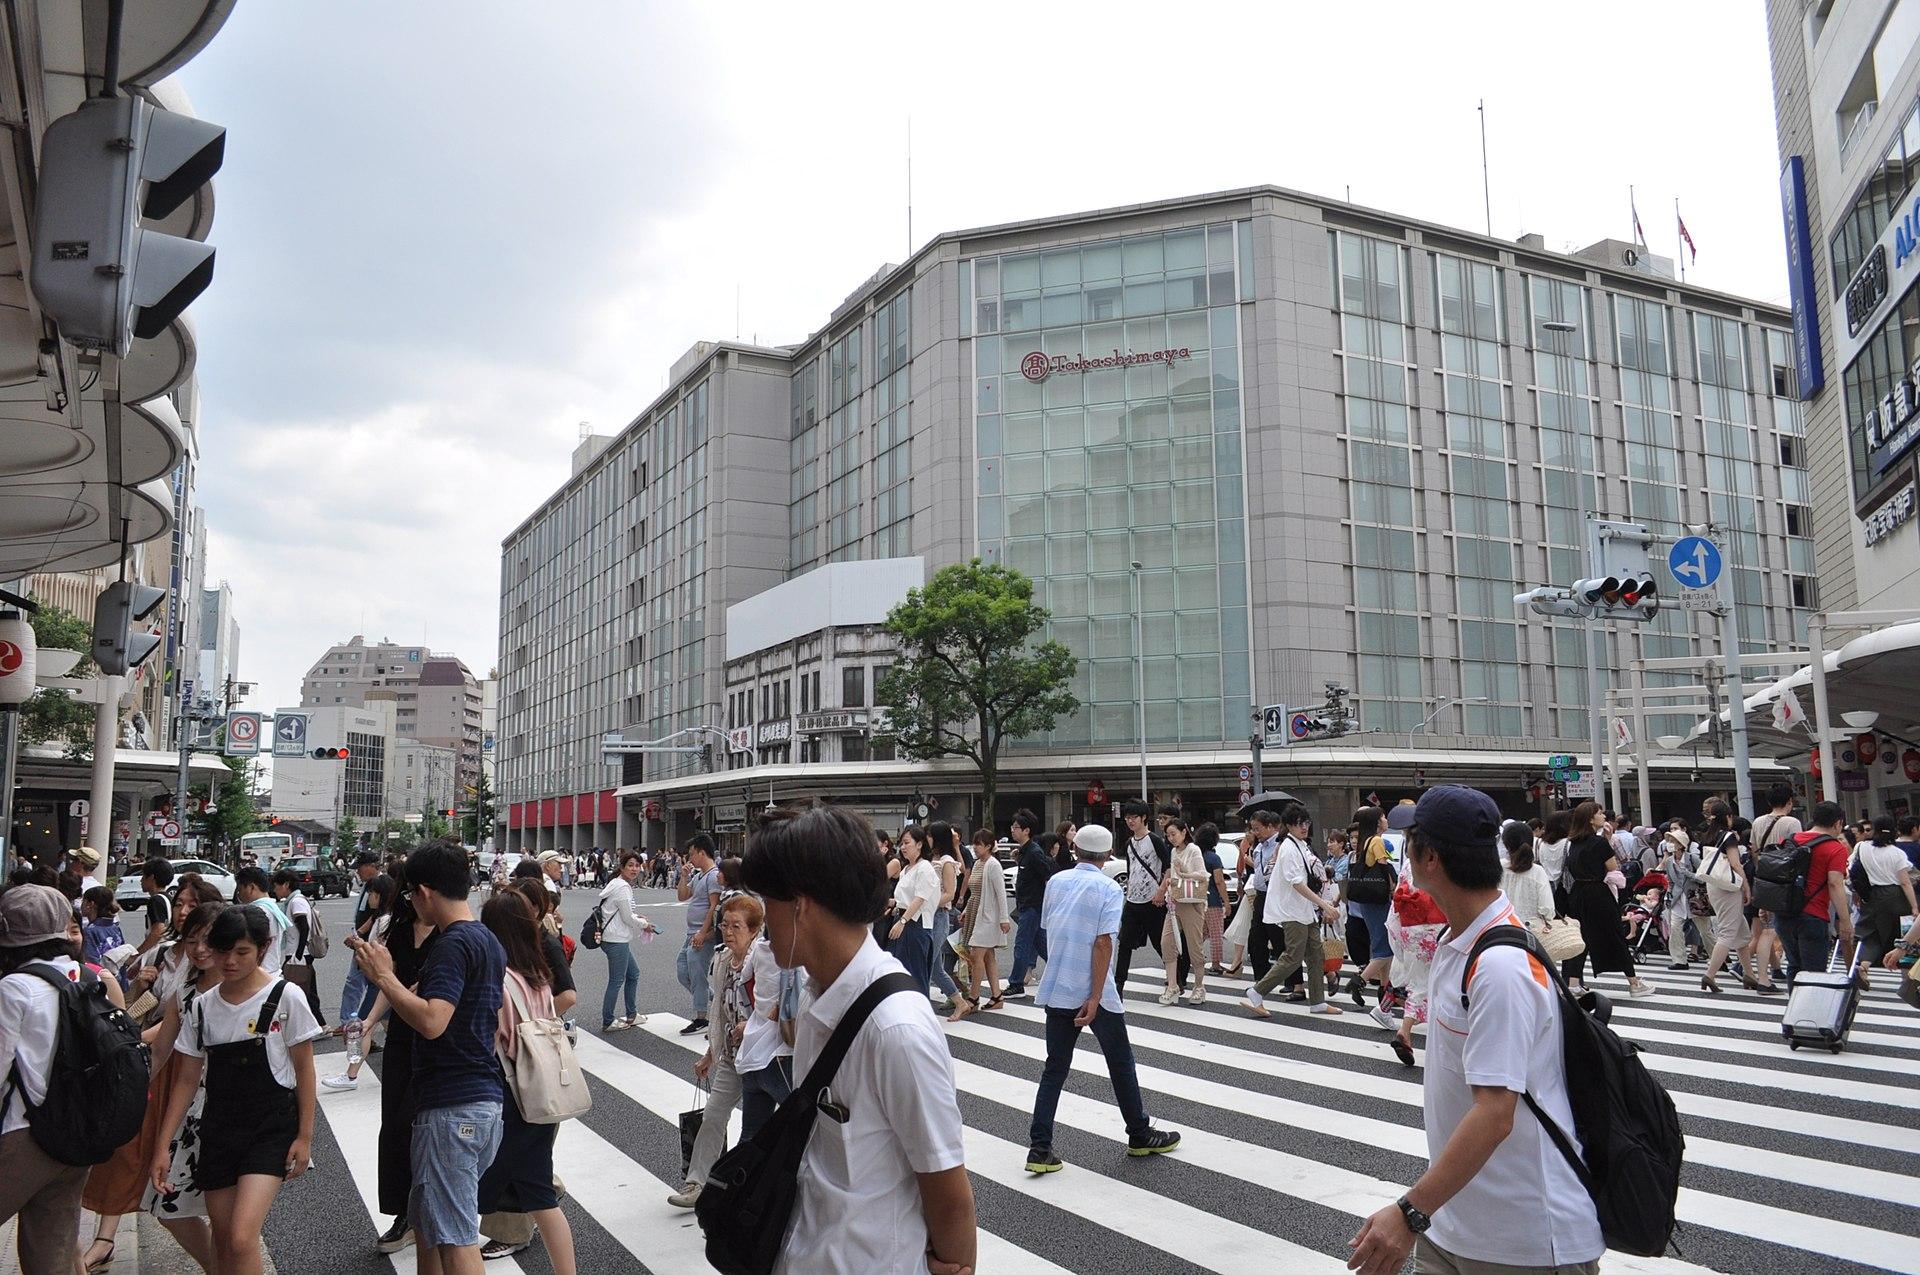 https://upload.wikimedia.org/wikipedia/commons/thumb/7/70/Shijo_Kawaramachi-2.jpg/1920px-Shijo_Kawaramachi-2.jpg